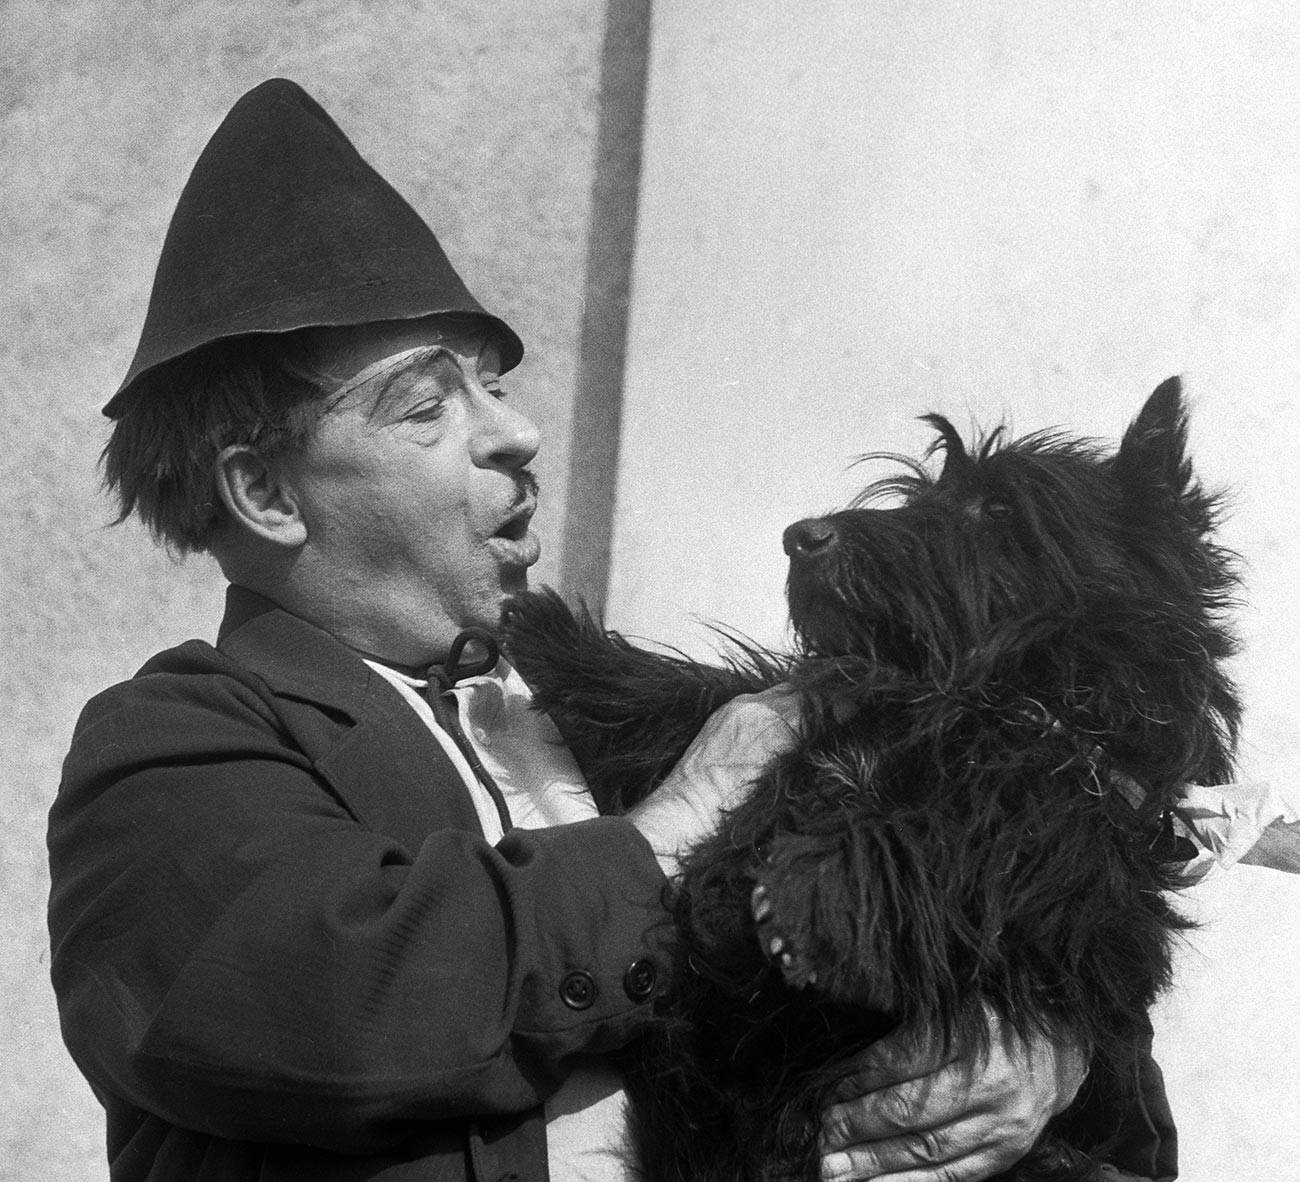 Rumyantsev's partner in crime on stage was a Scottish Terrier.